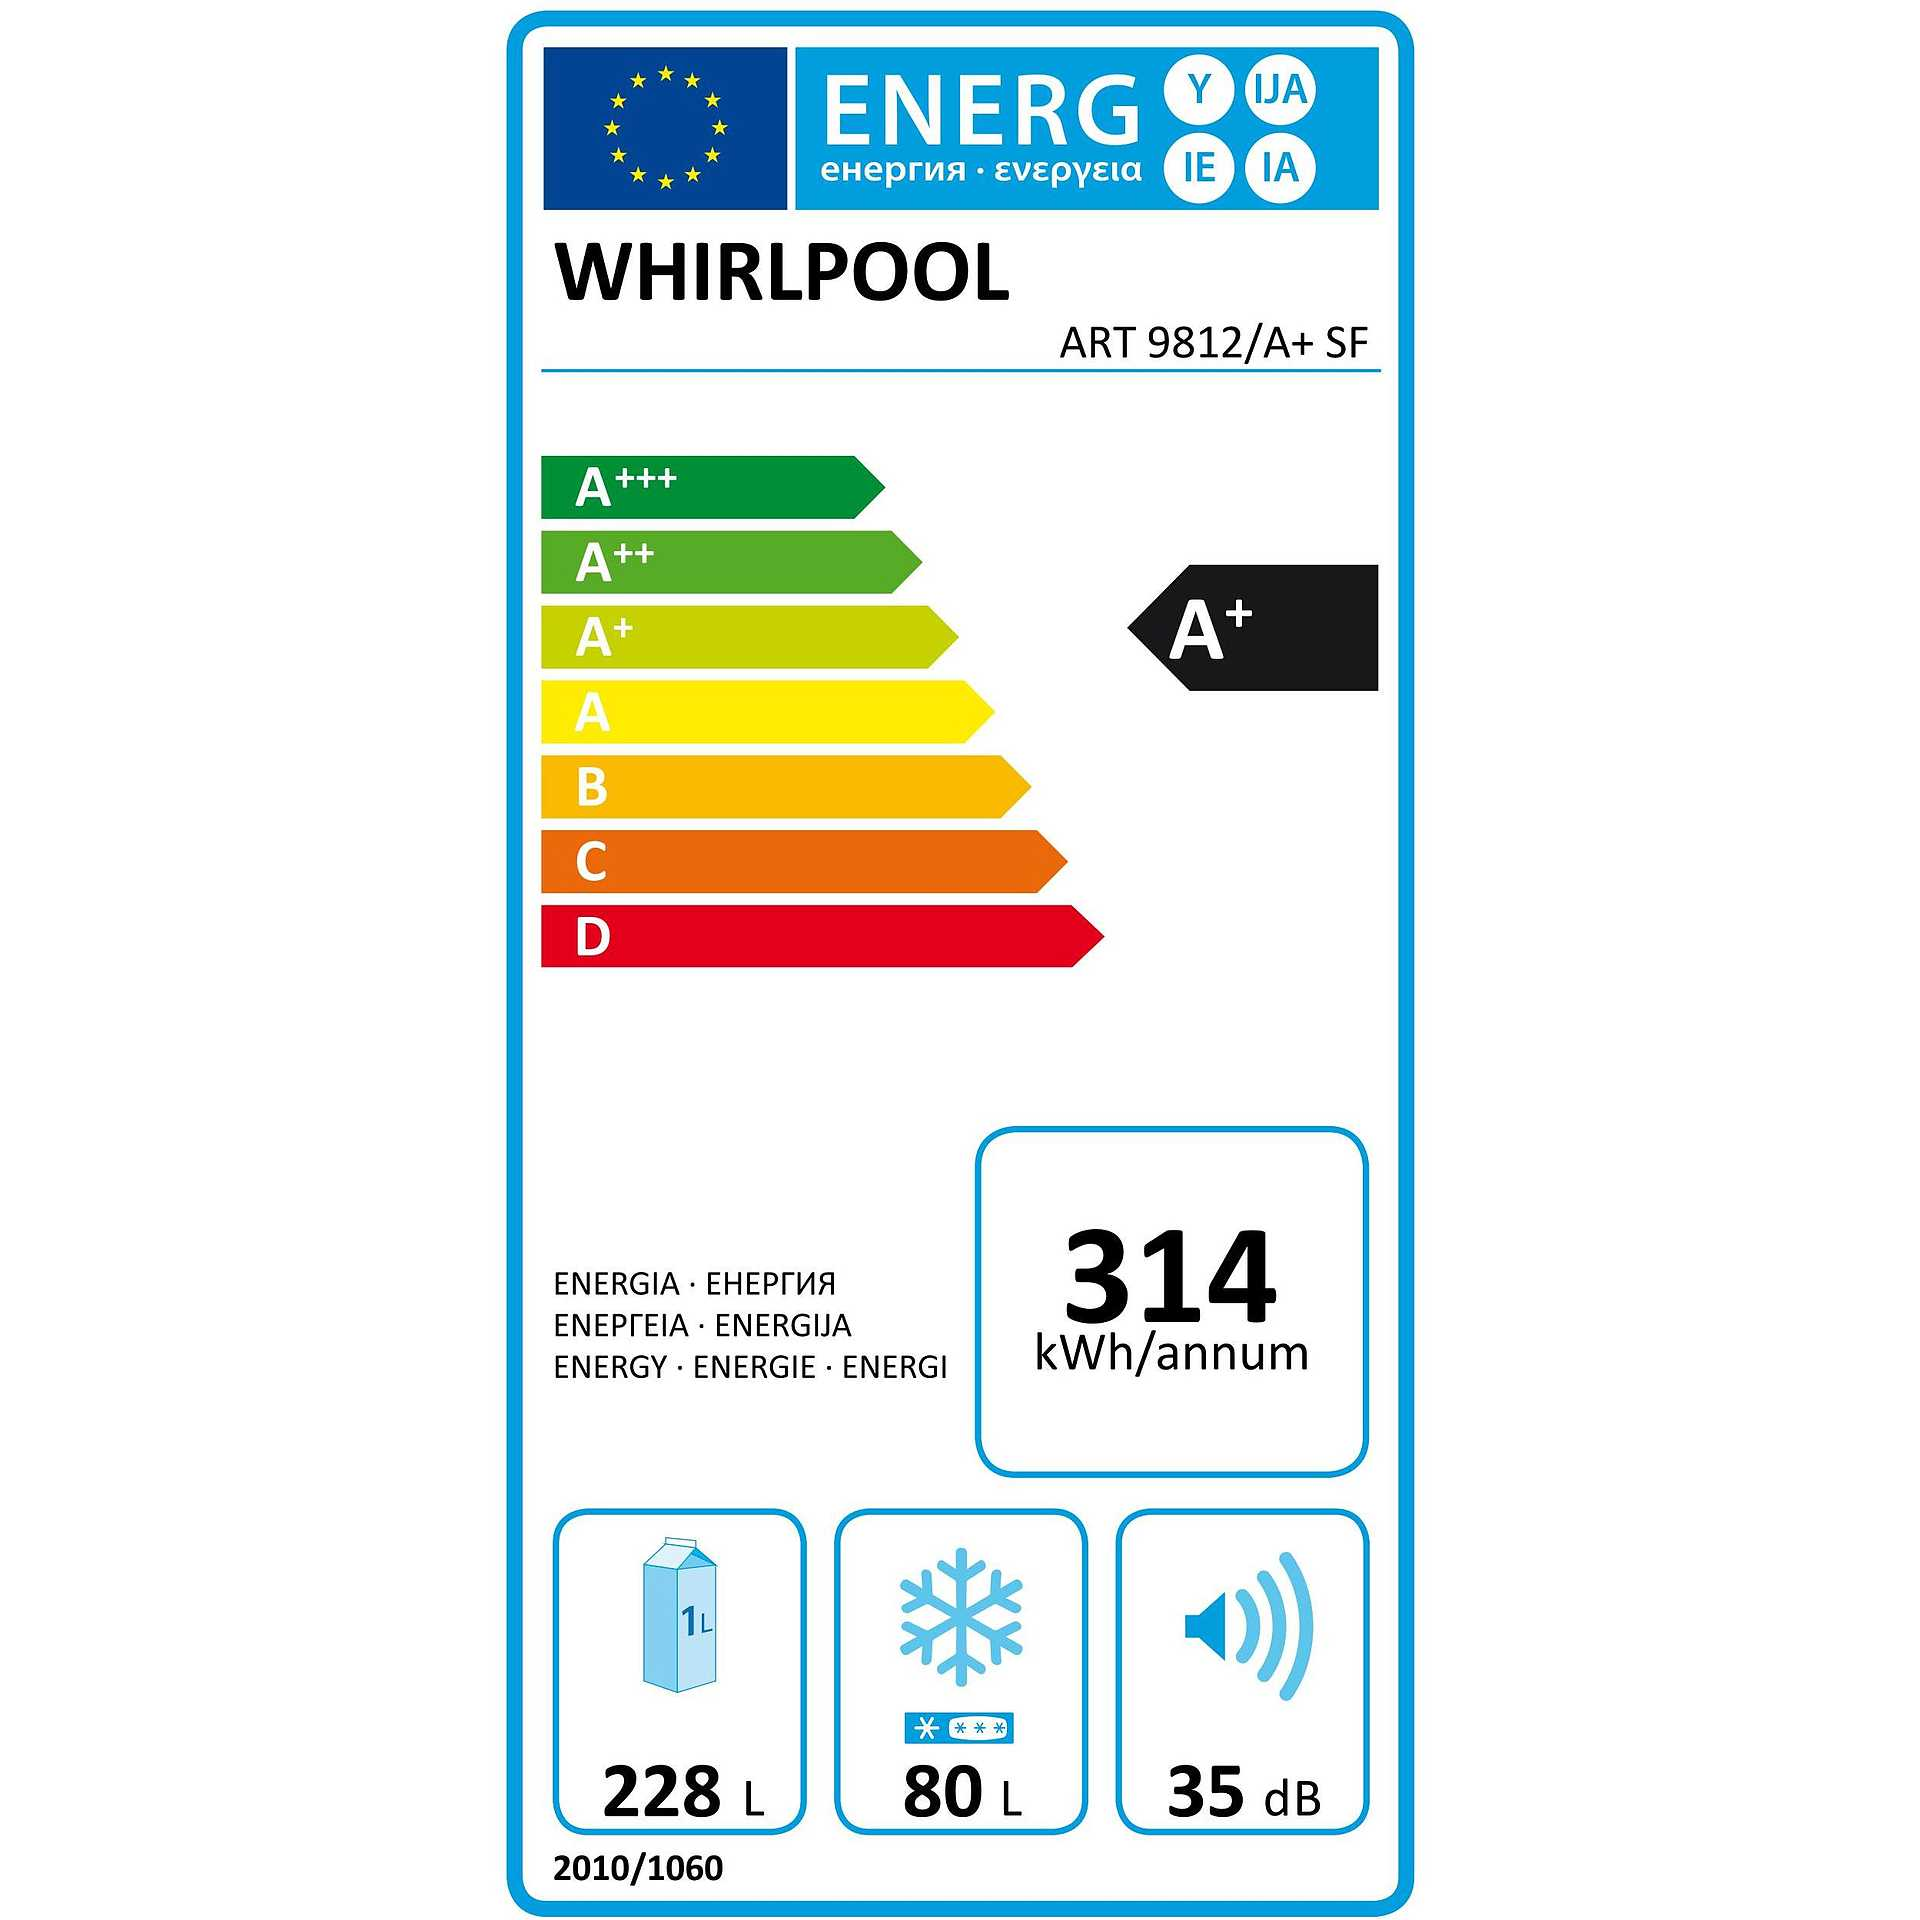 ART 9812/A+ SF Whirlpool frigorifero combinato da incasso 308lt ...